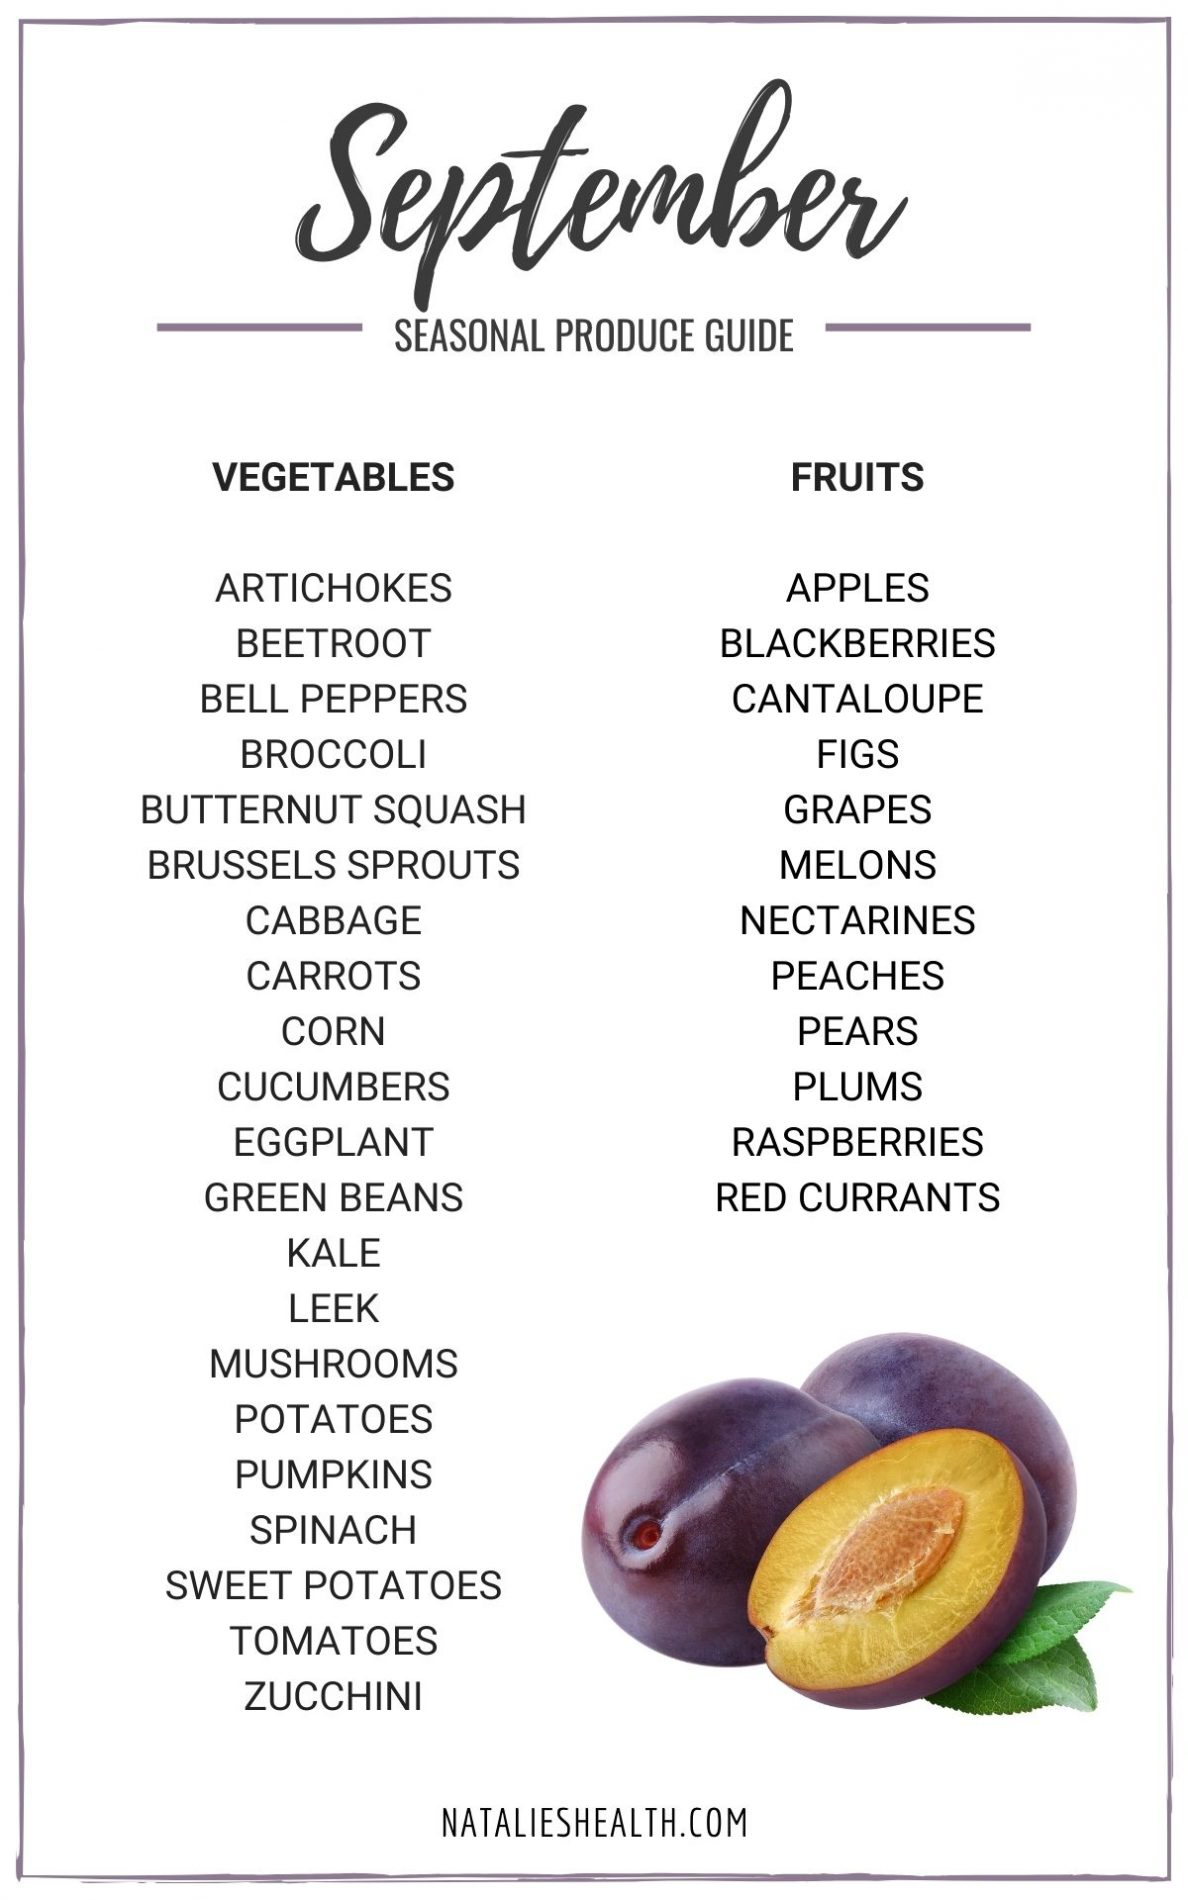 Seasonal Produce Guide What's in Season SEPTEMBER PINimage